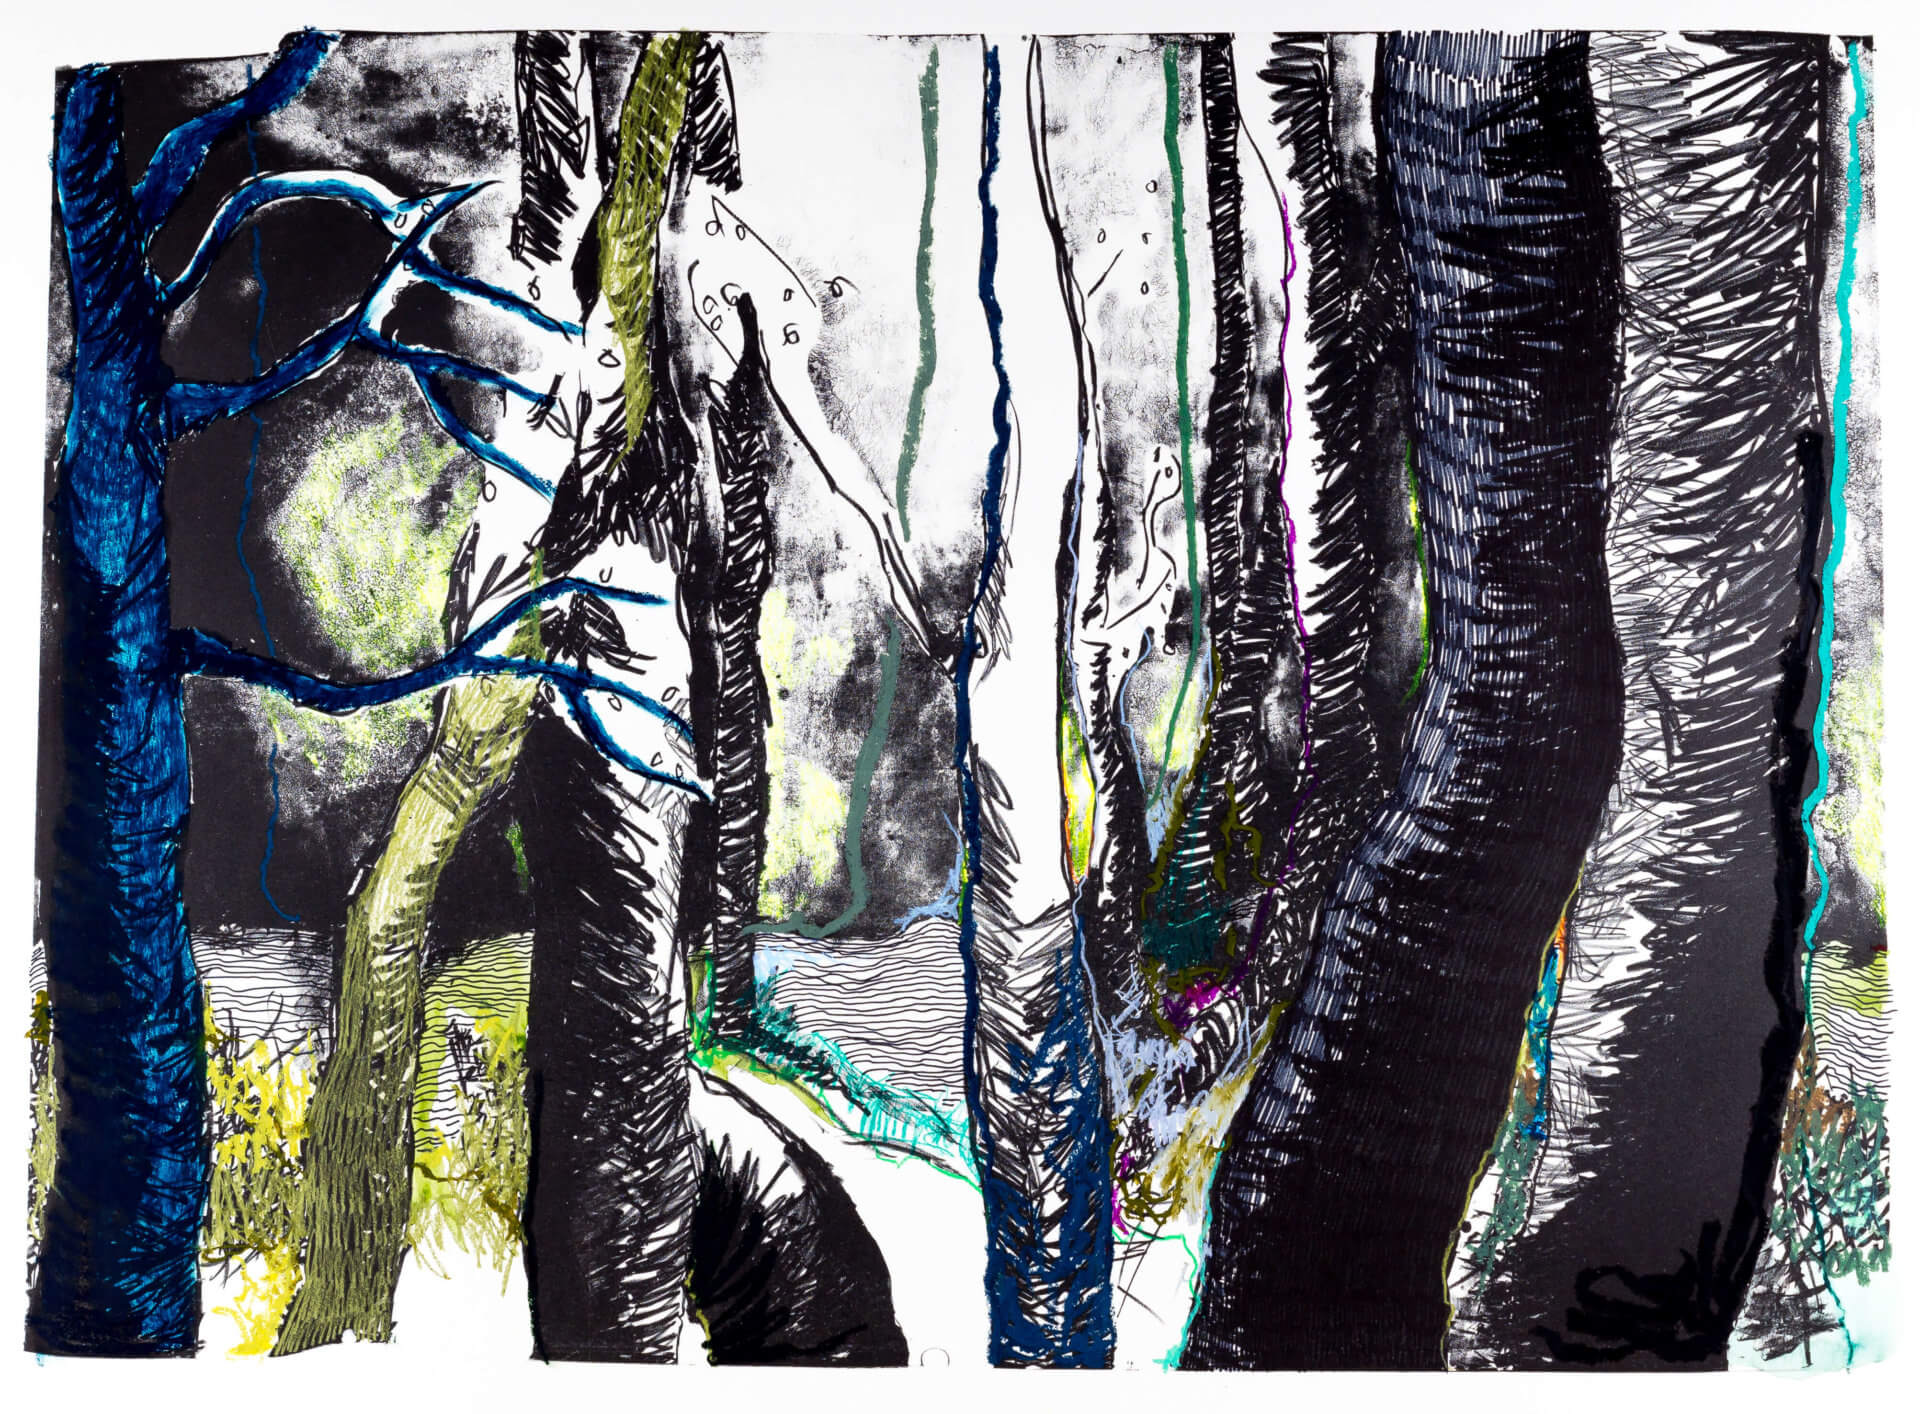 Katharina Albers, Wald (F_A)(C), 2015, Lithographie handkoloriert (Ölkreide, Graphit, Aquarellfarbe, Fineliner), Unikat, 70×100 cm